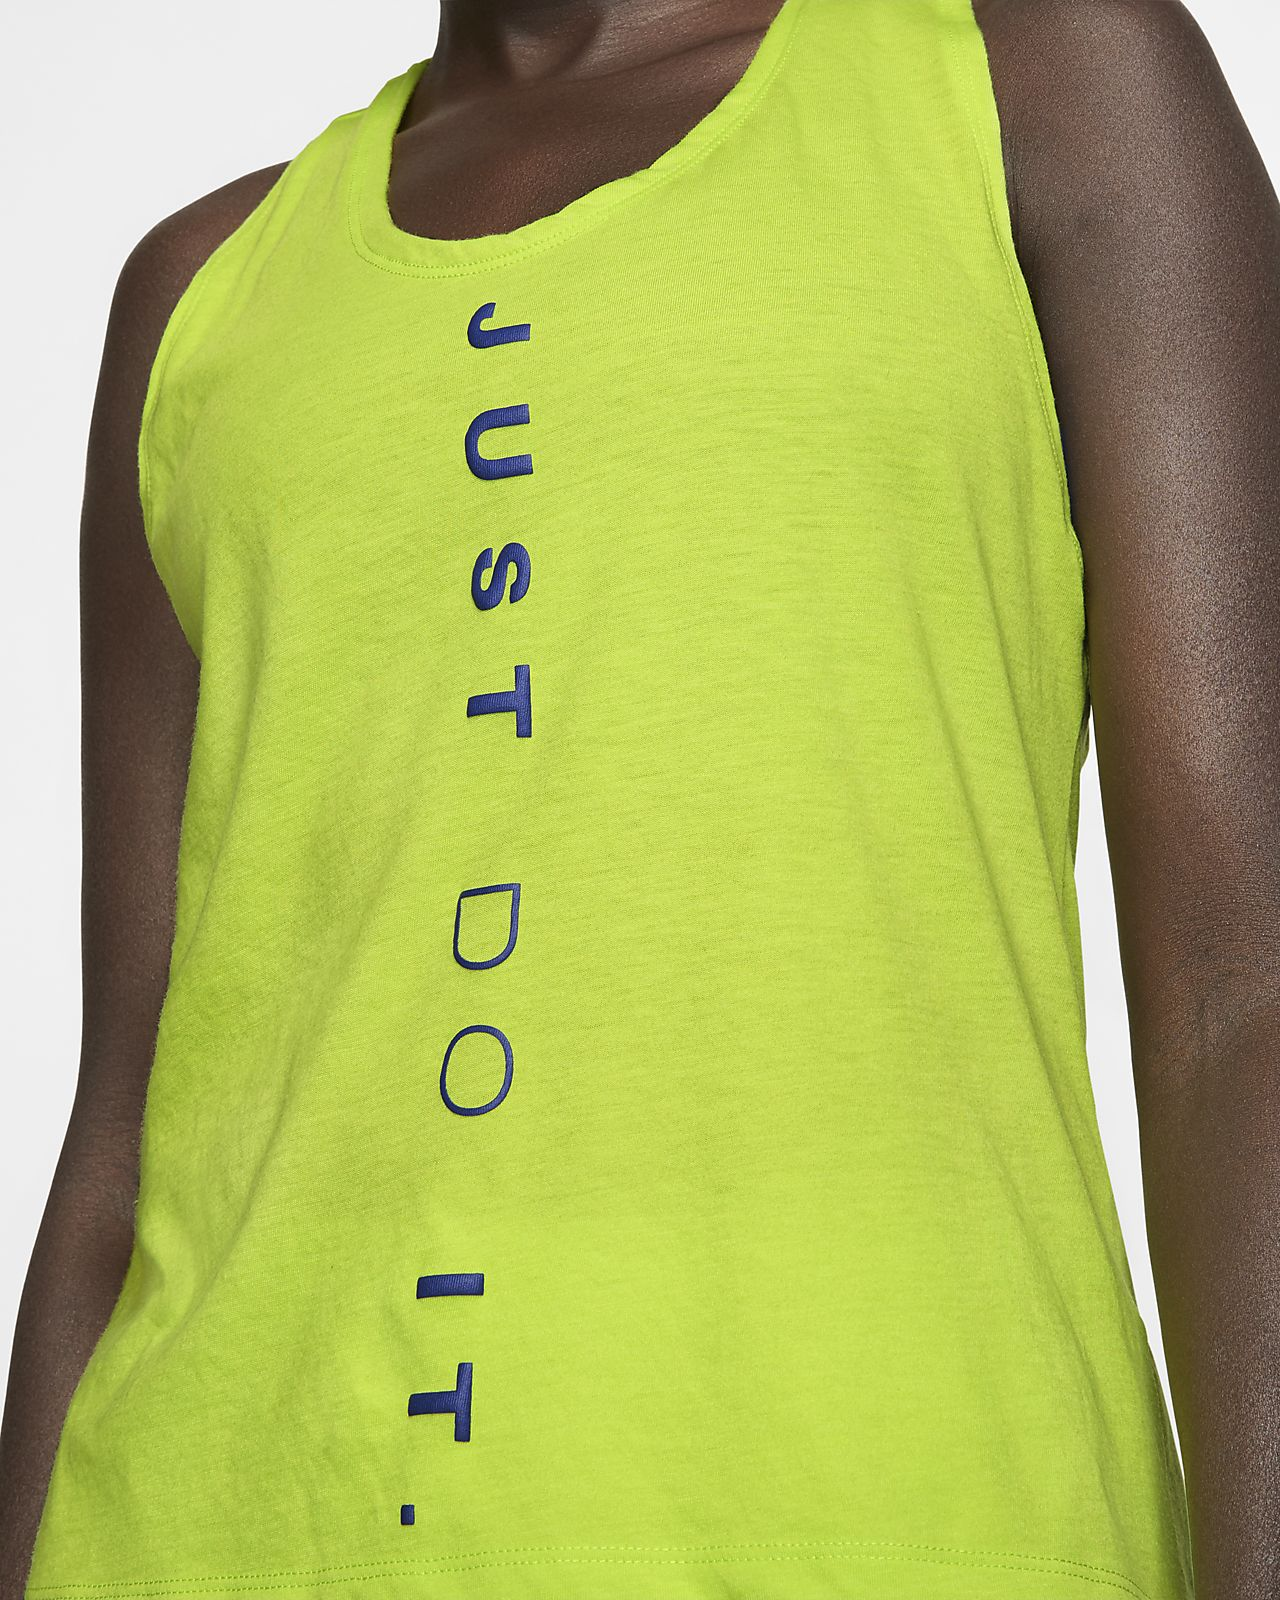 3aff43acc0 Low Resolution Nike Dri-FIT Miler Women's Running Tank Nike Dri-FIT Miler  Women's Running Tank